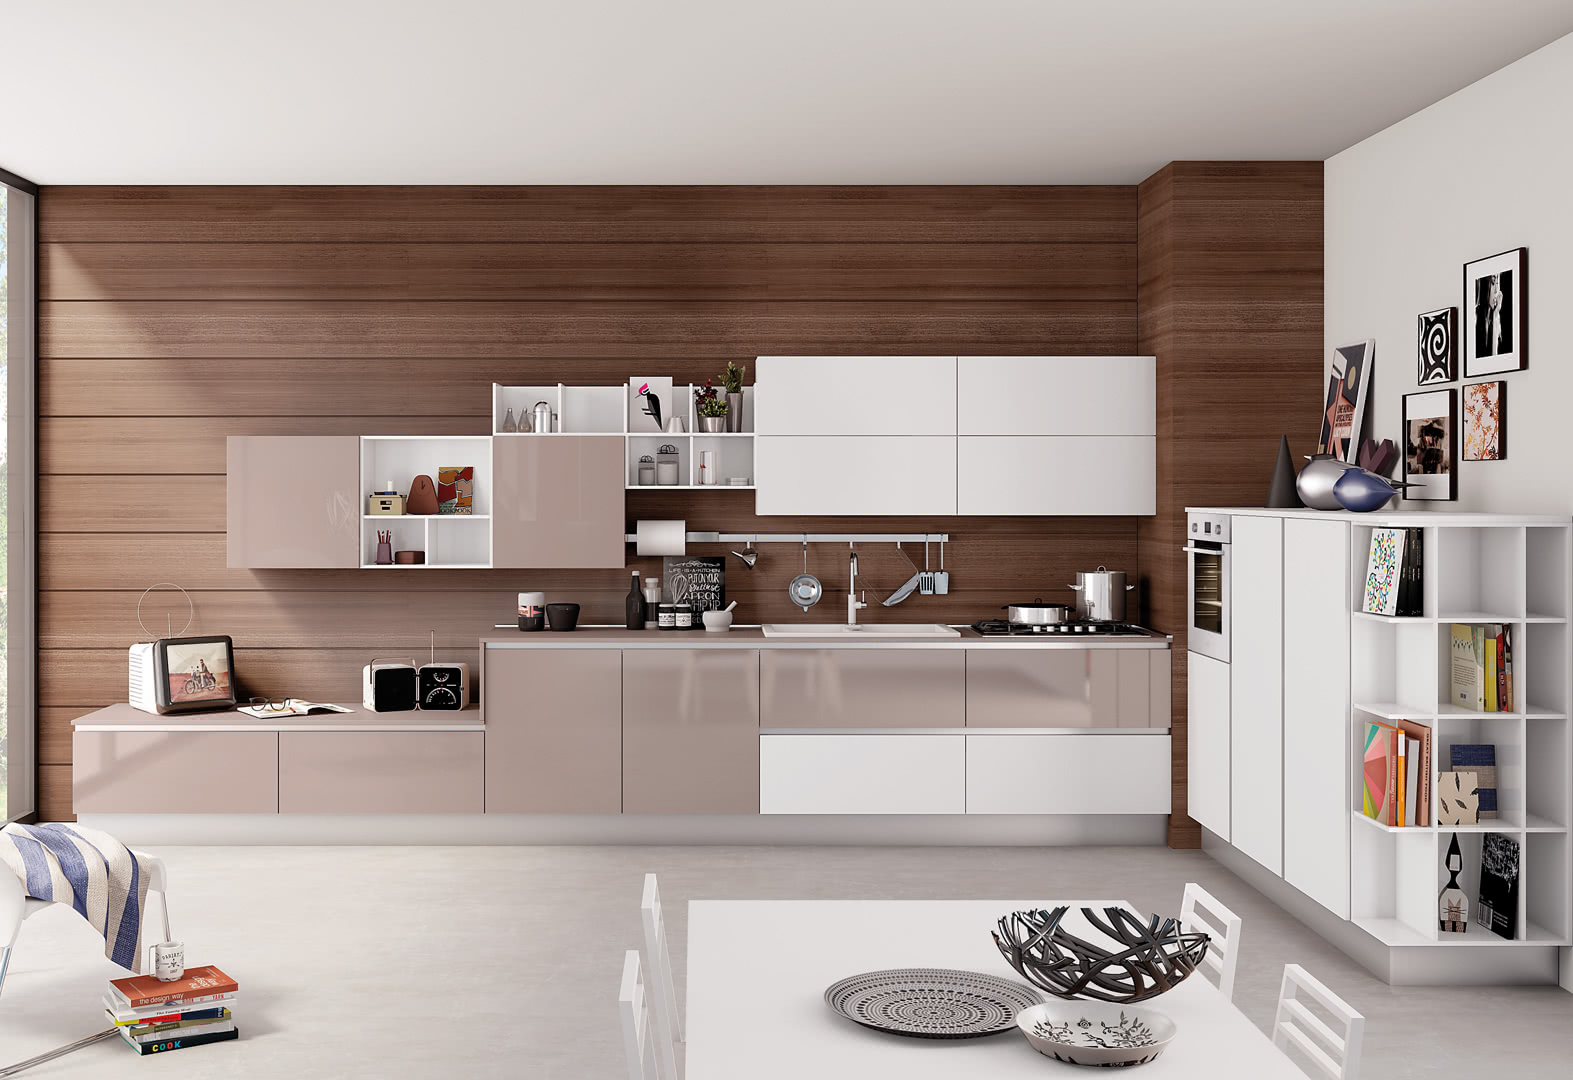 1598_kyra-cucina-ambientata-27